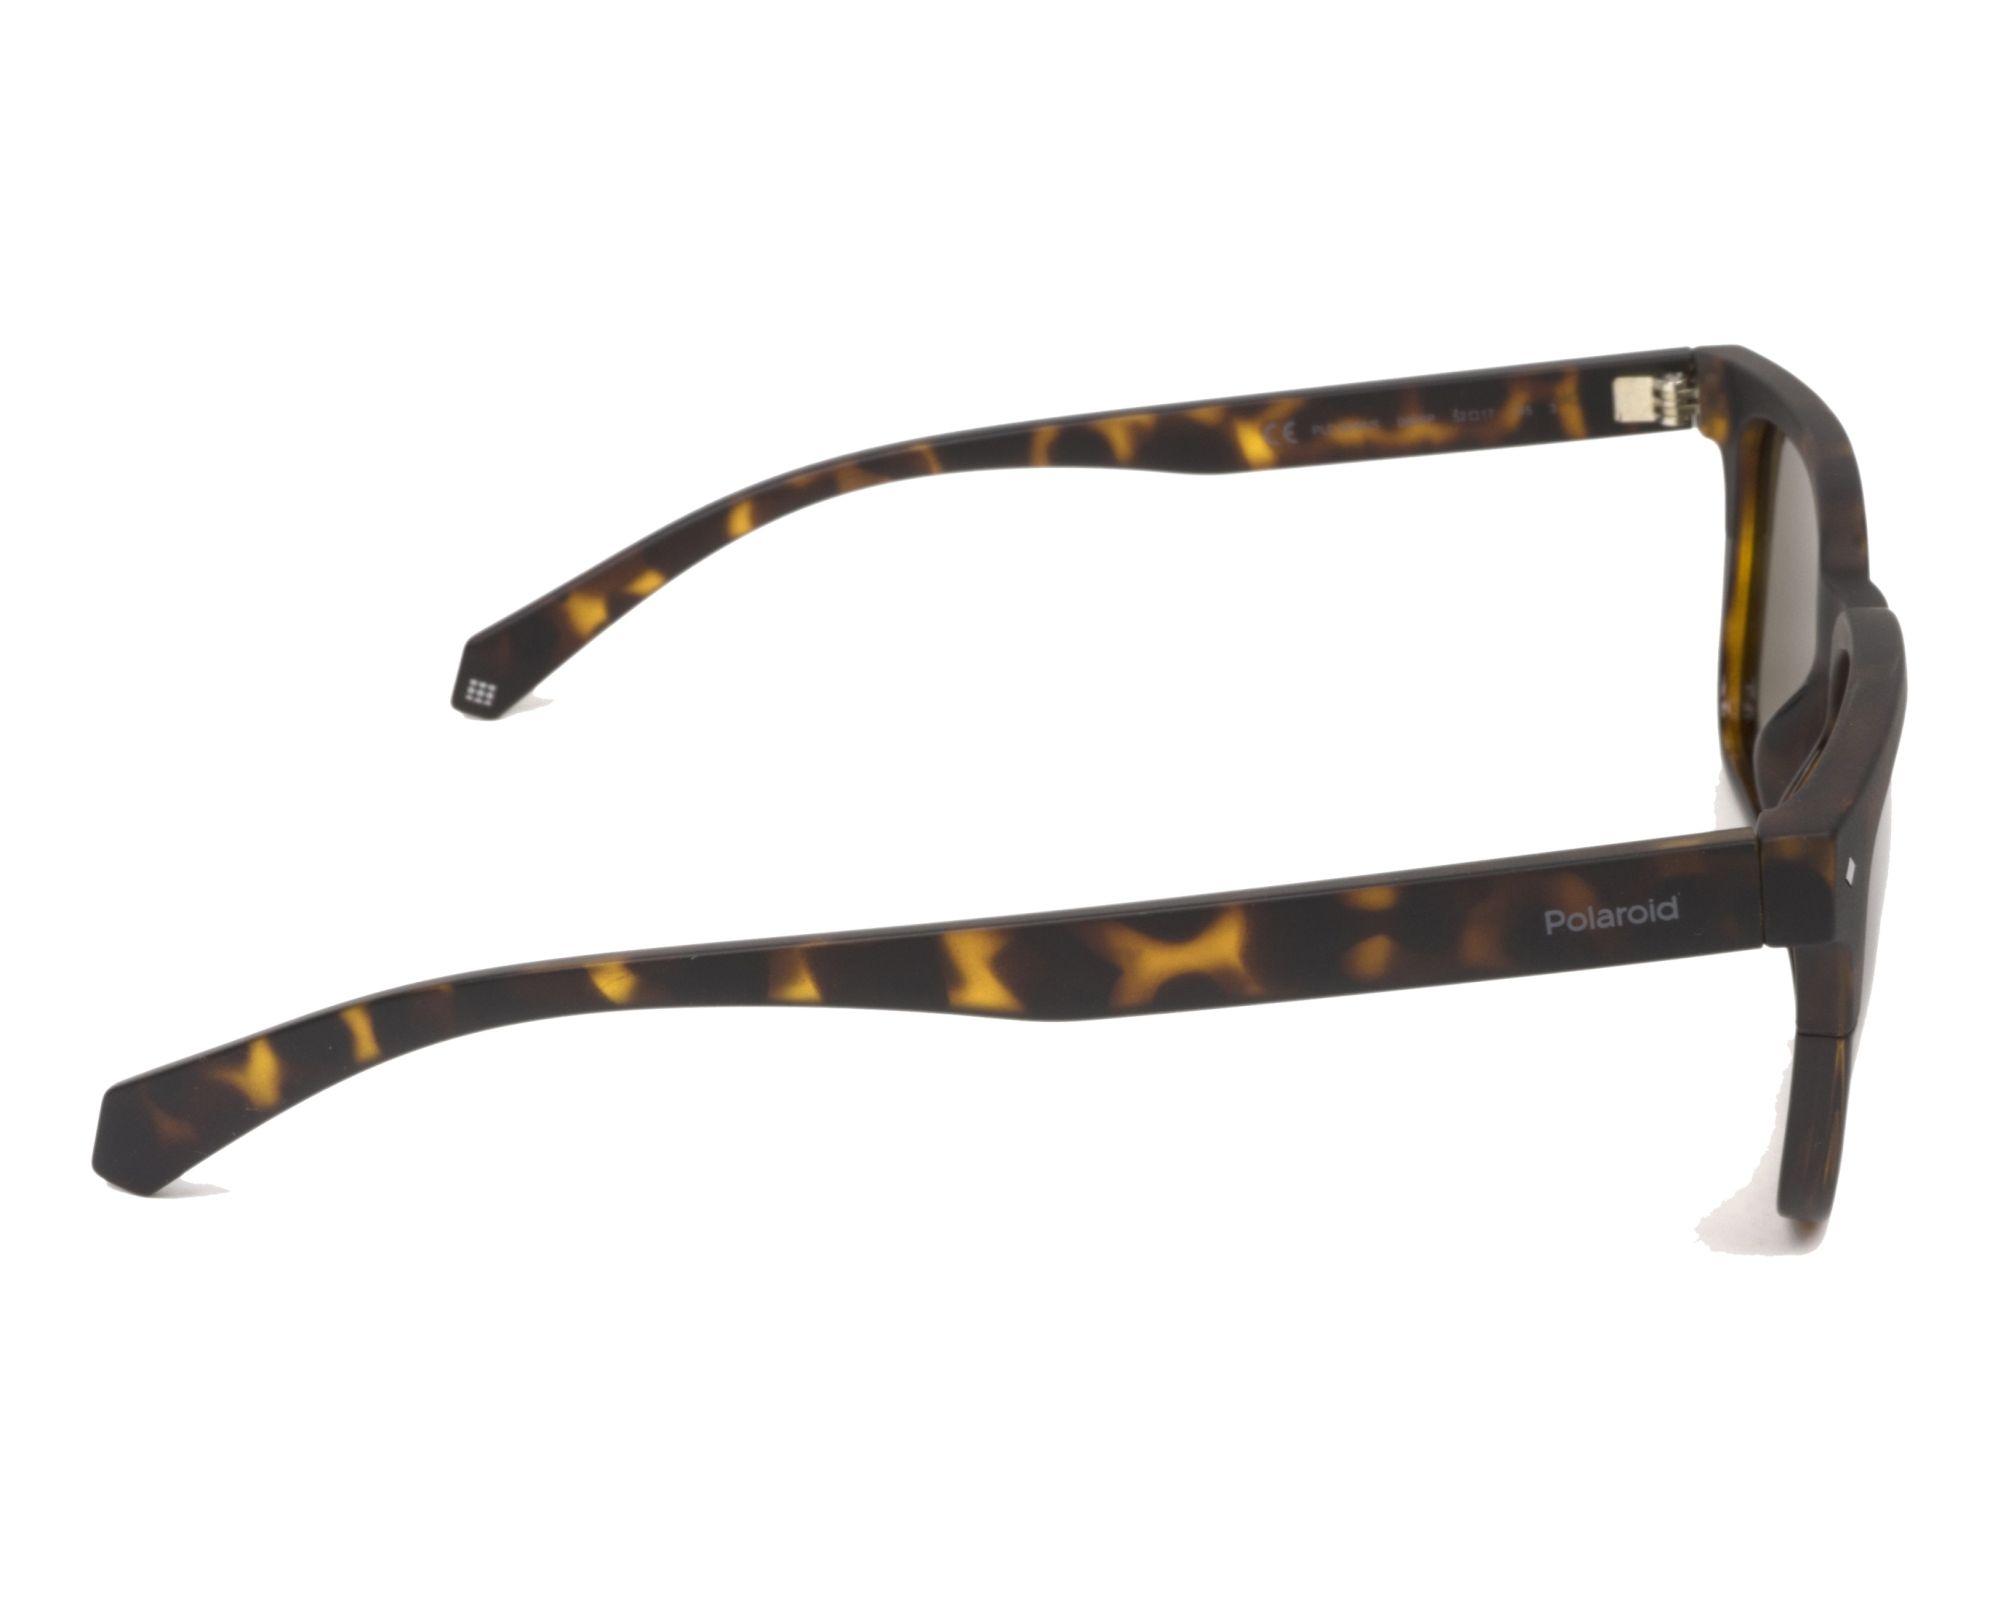 9d871eac929 Sunglasses Polaroid PLD-6044-S 086 SP 52-17 Havana Havana side